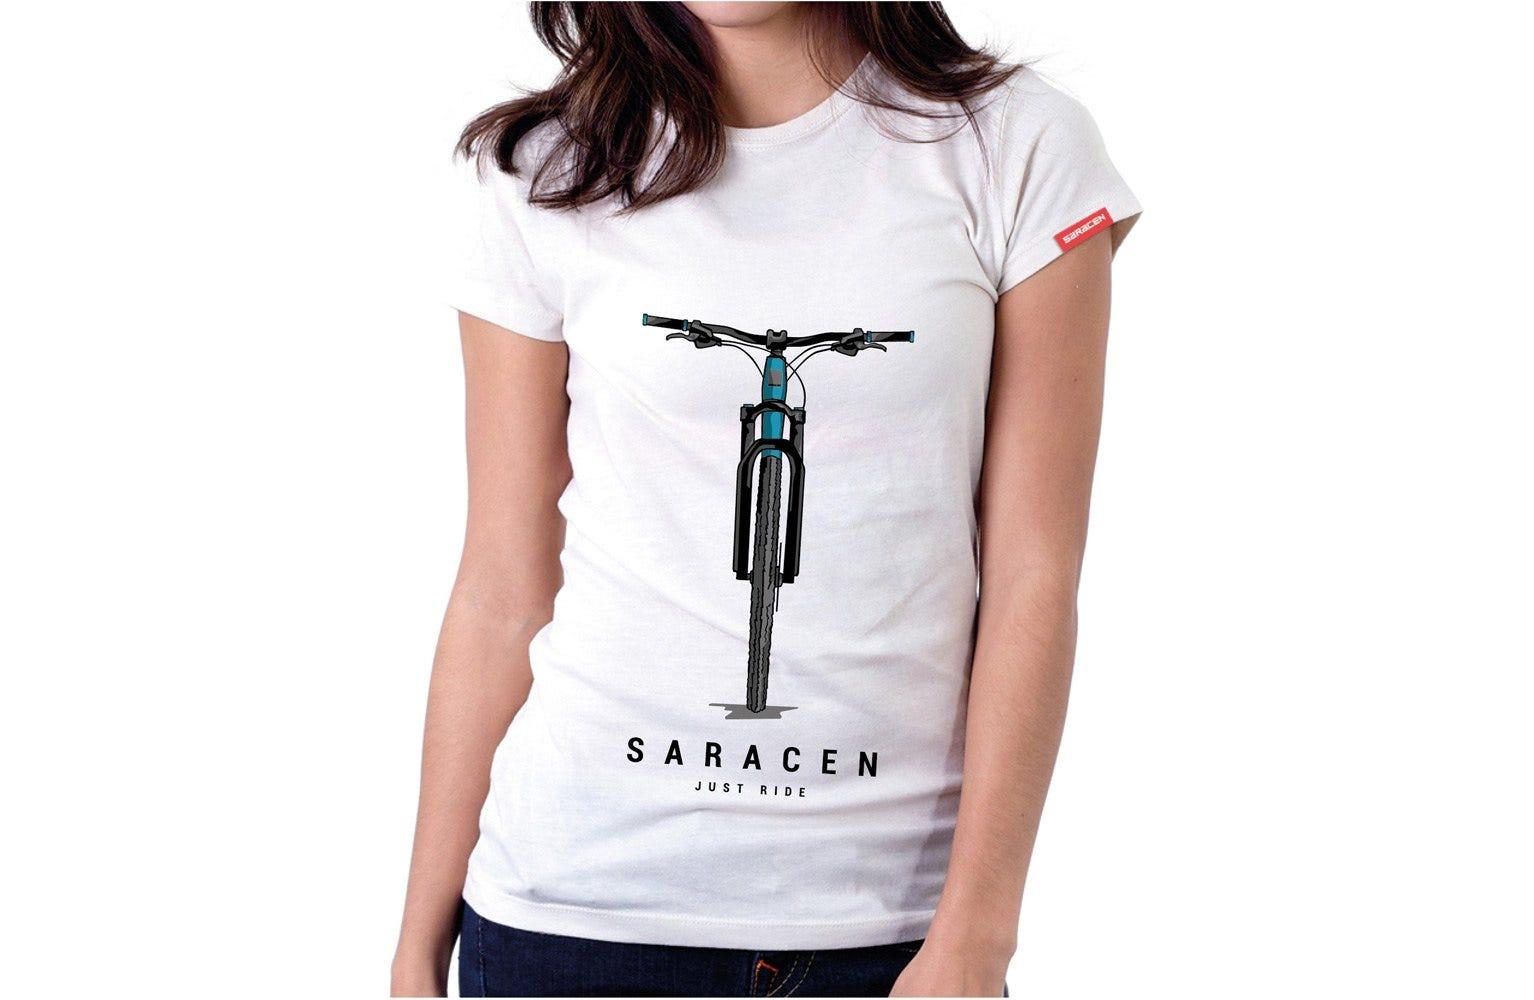 Saracen Womens T-Shirt Front View Bike